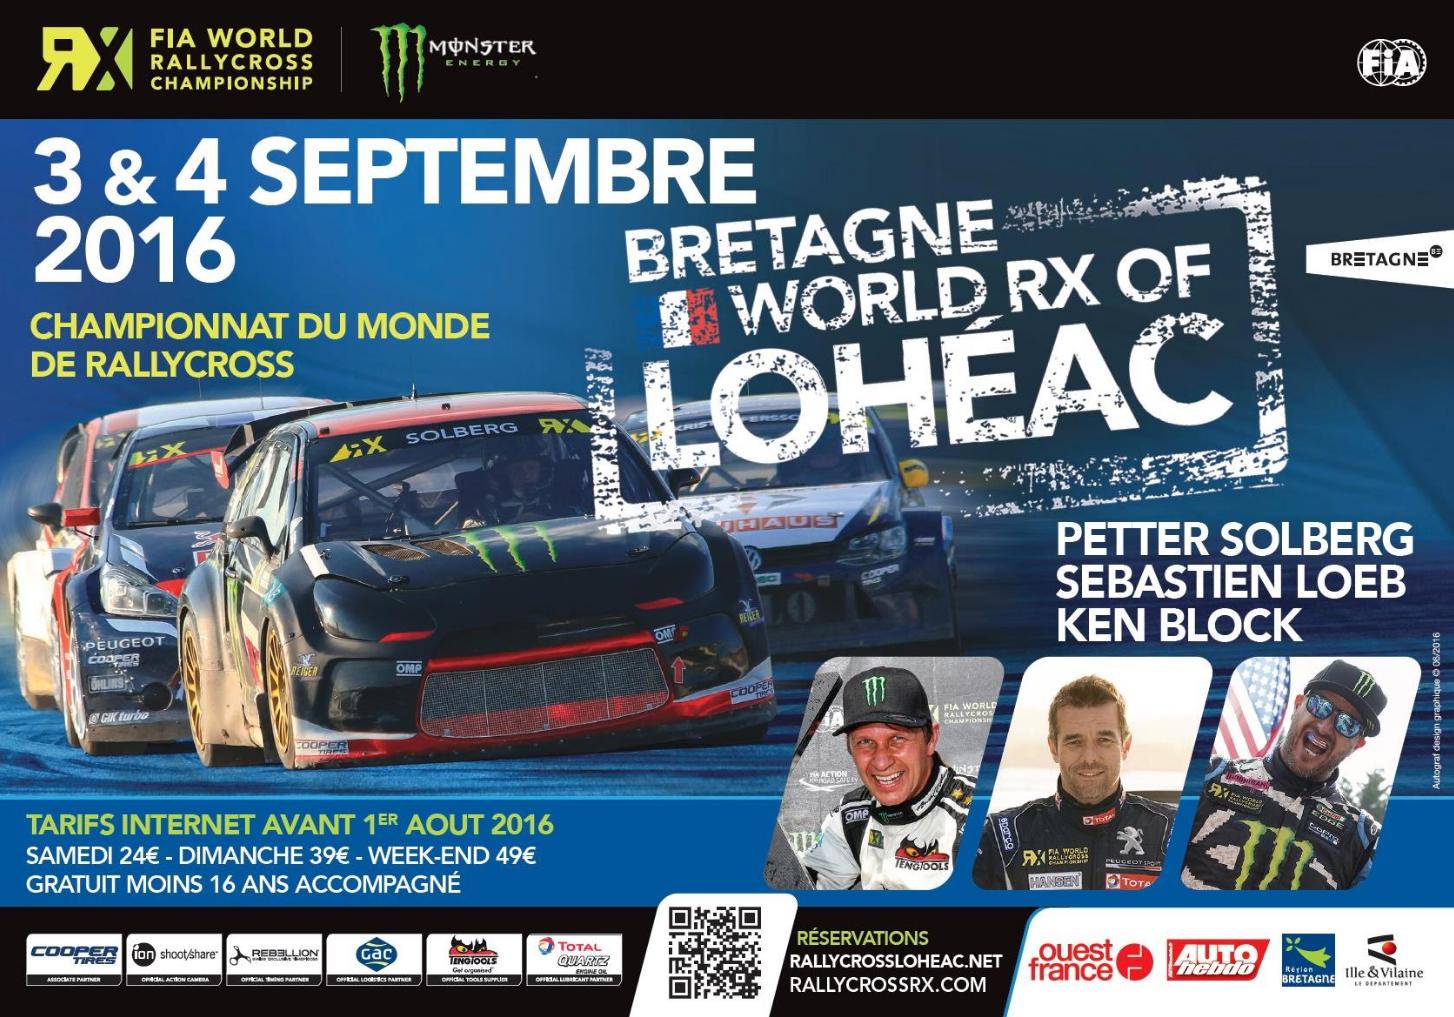 Marque Bretagne - Rallycross de Lohéac - Affiche - 2016